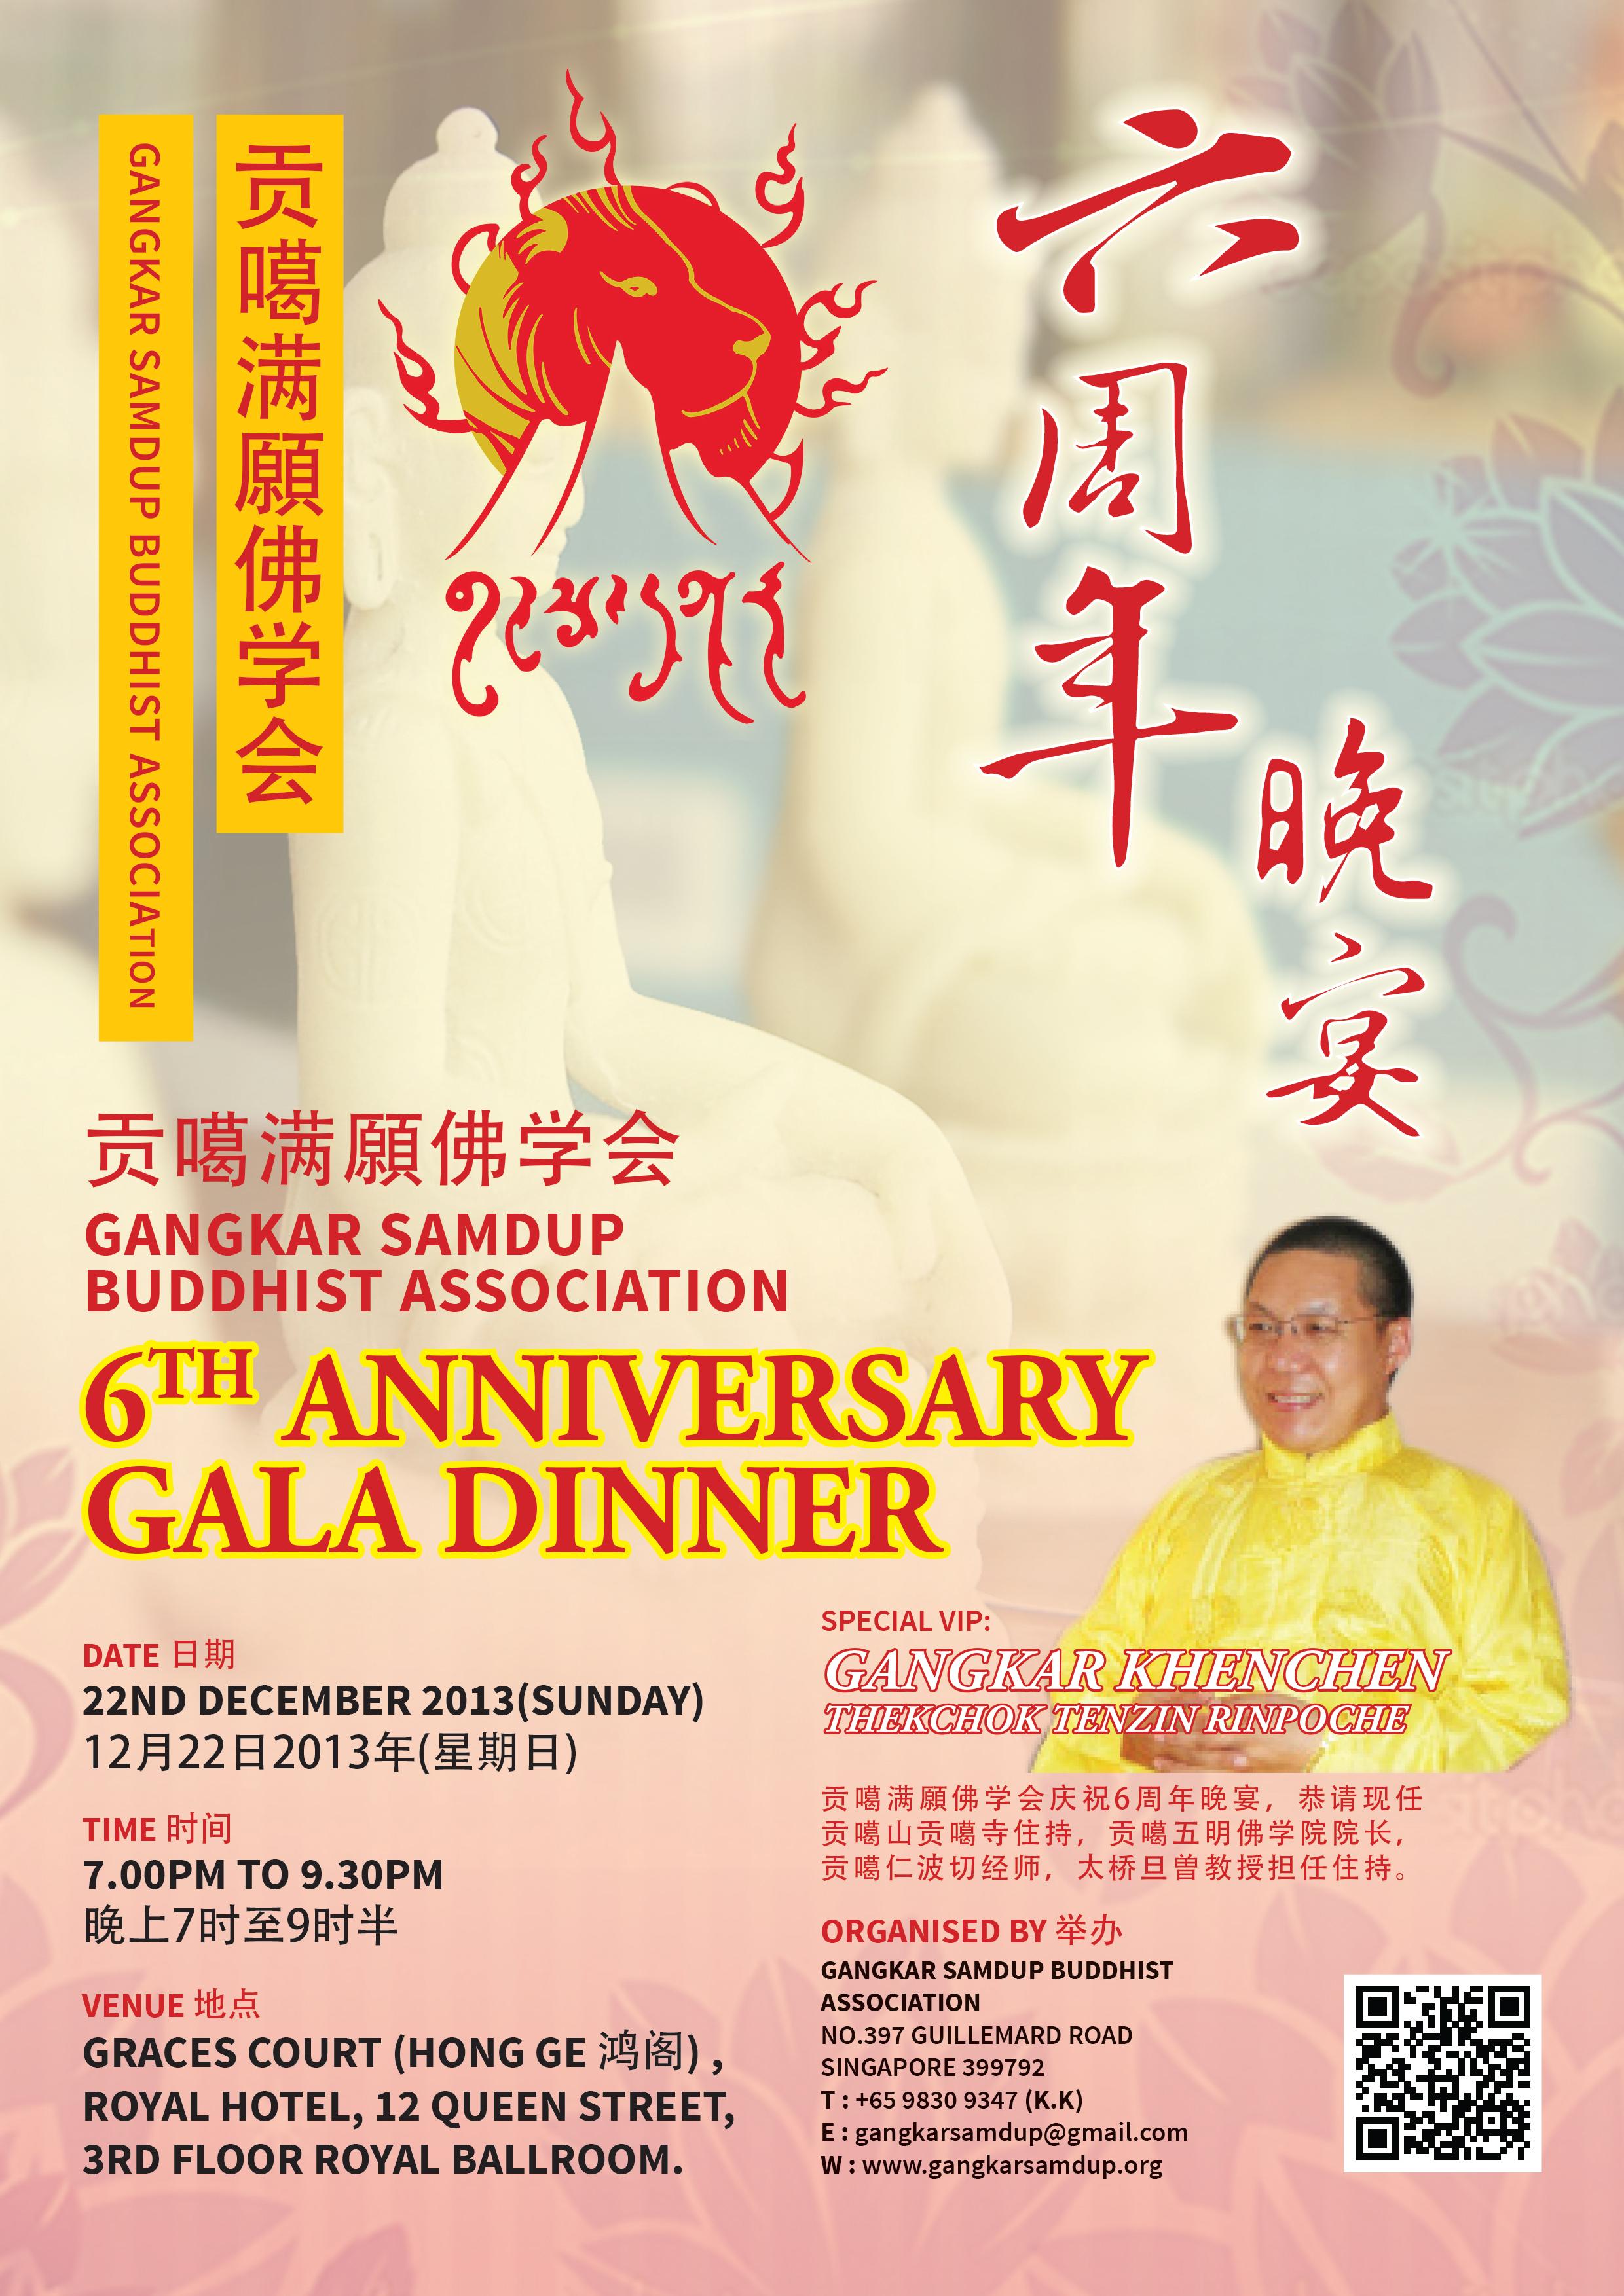 Gangkar Samdup Buddhist Association 6th Anniversary Gala Dinner